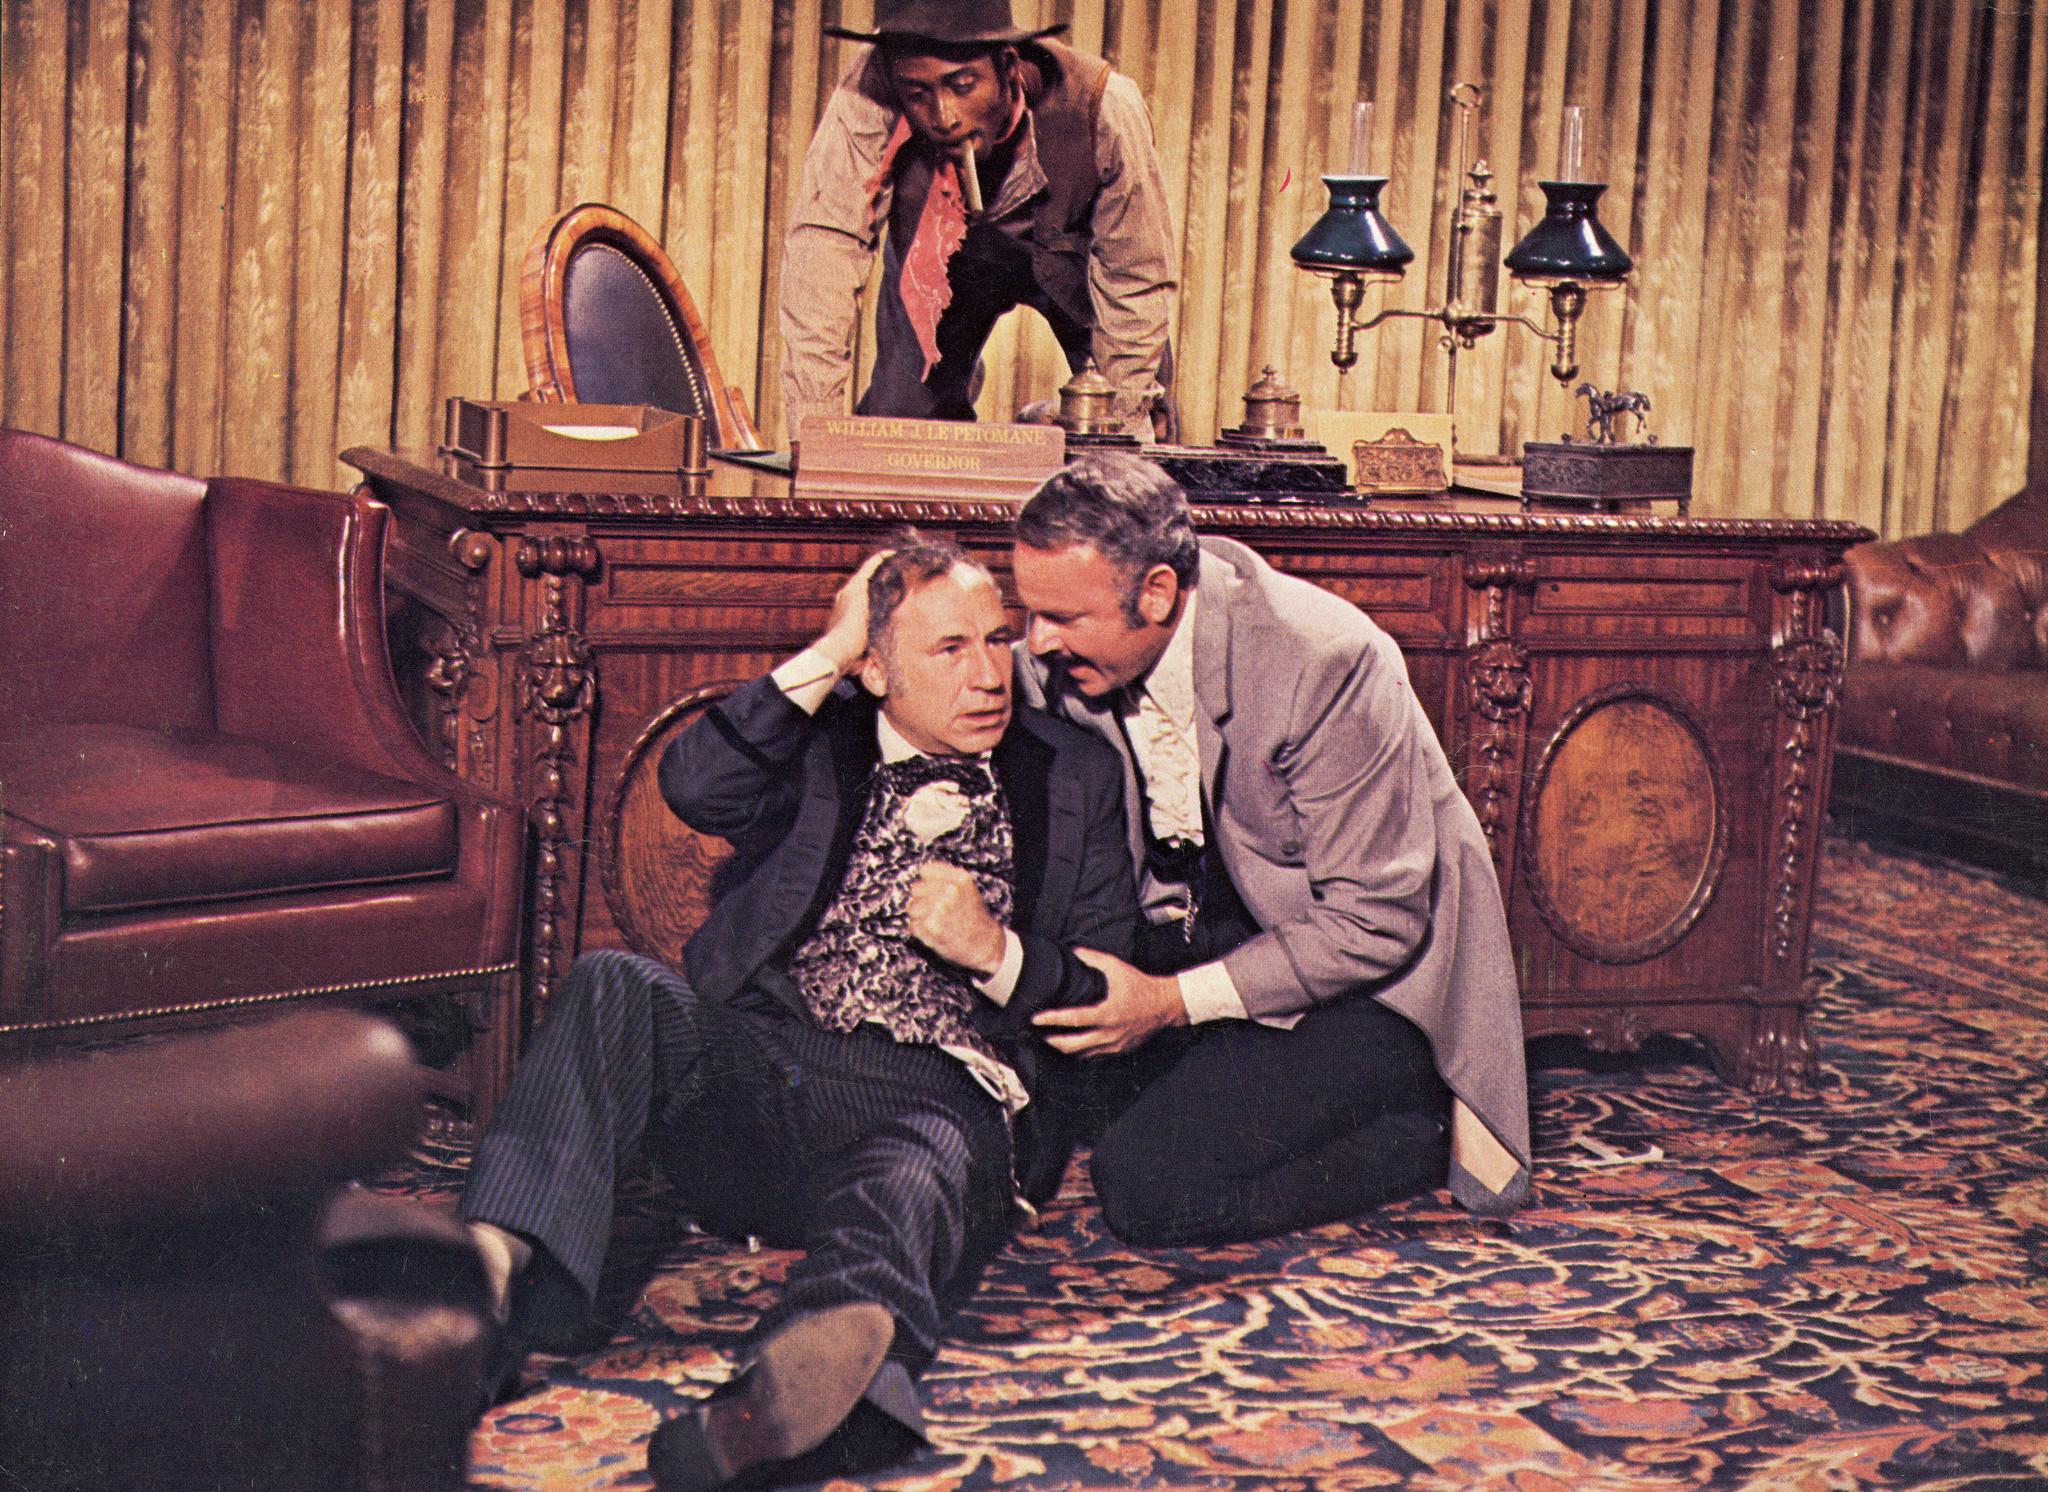 Mel Brooks, Cleavon Little, and Harvey Korman in Blazing Saddles (1974)